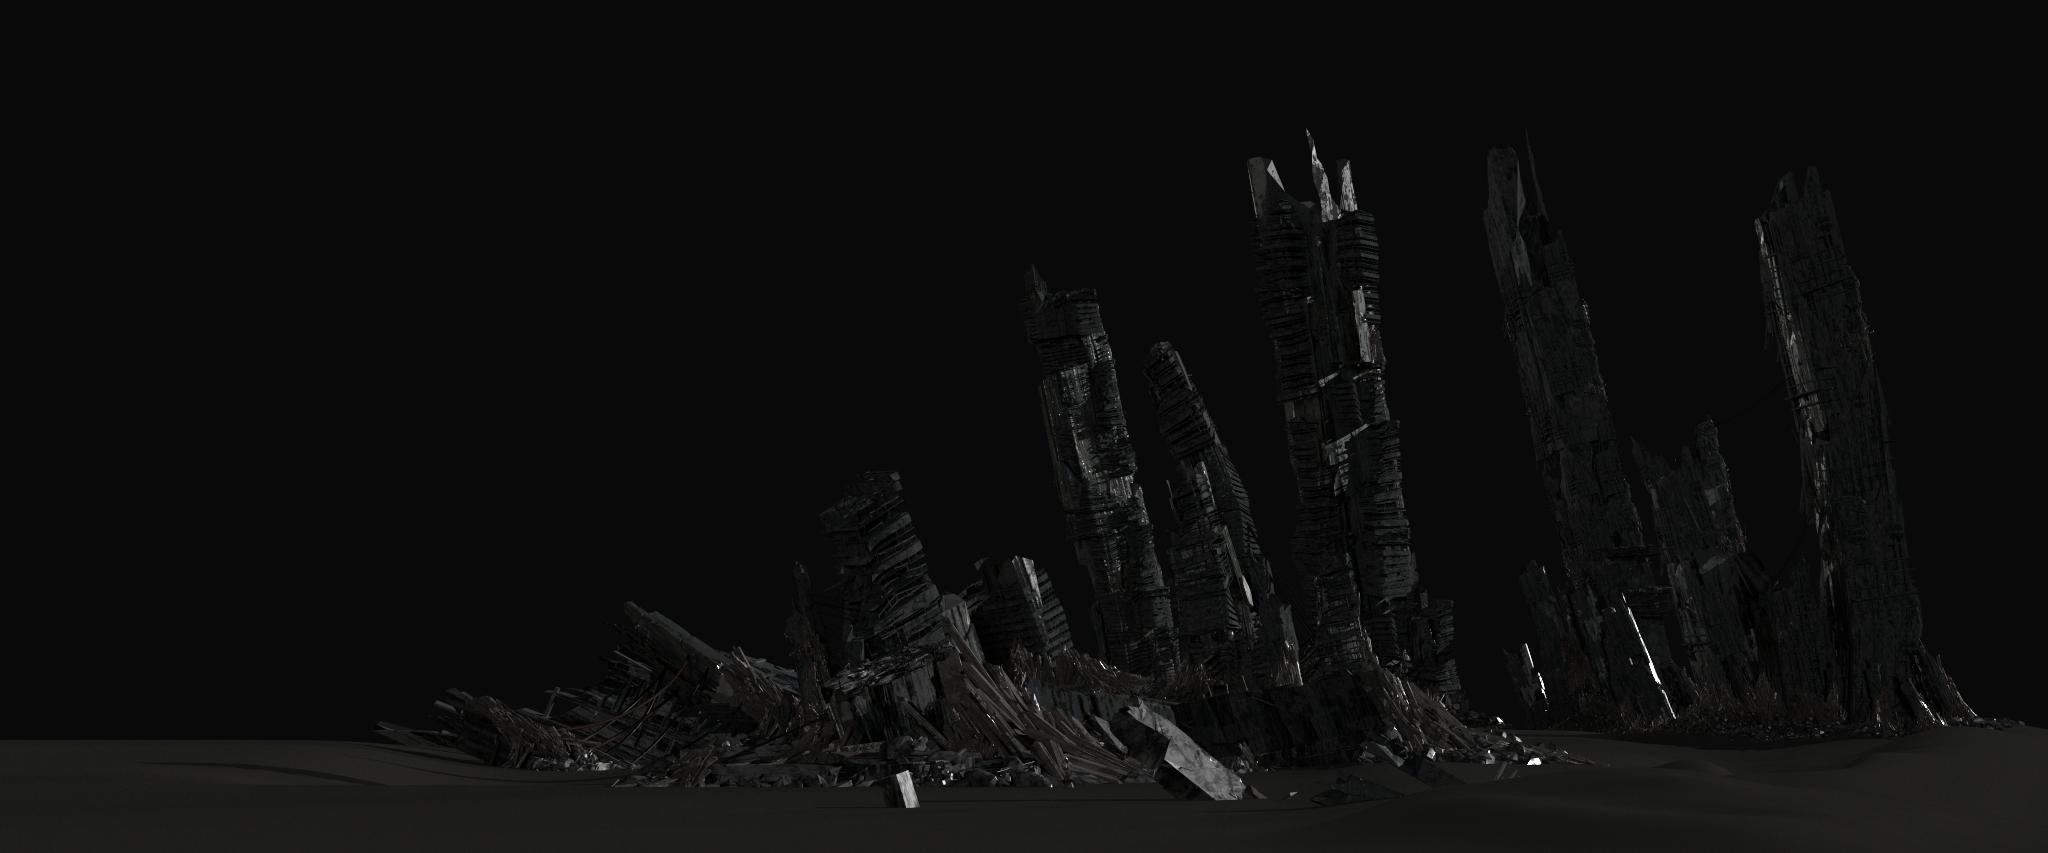 modelling, texturing, lighting, rendering